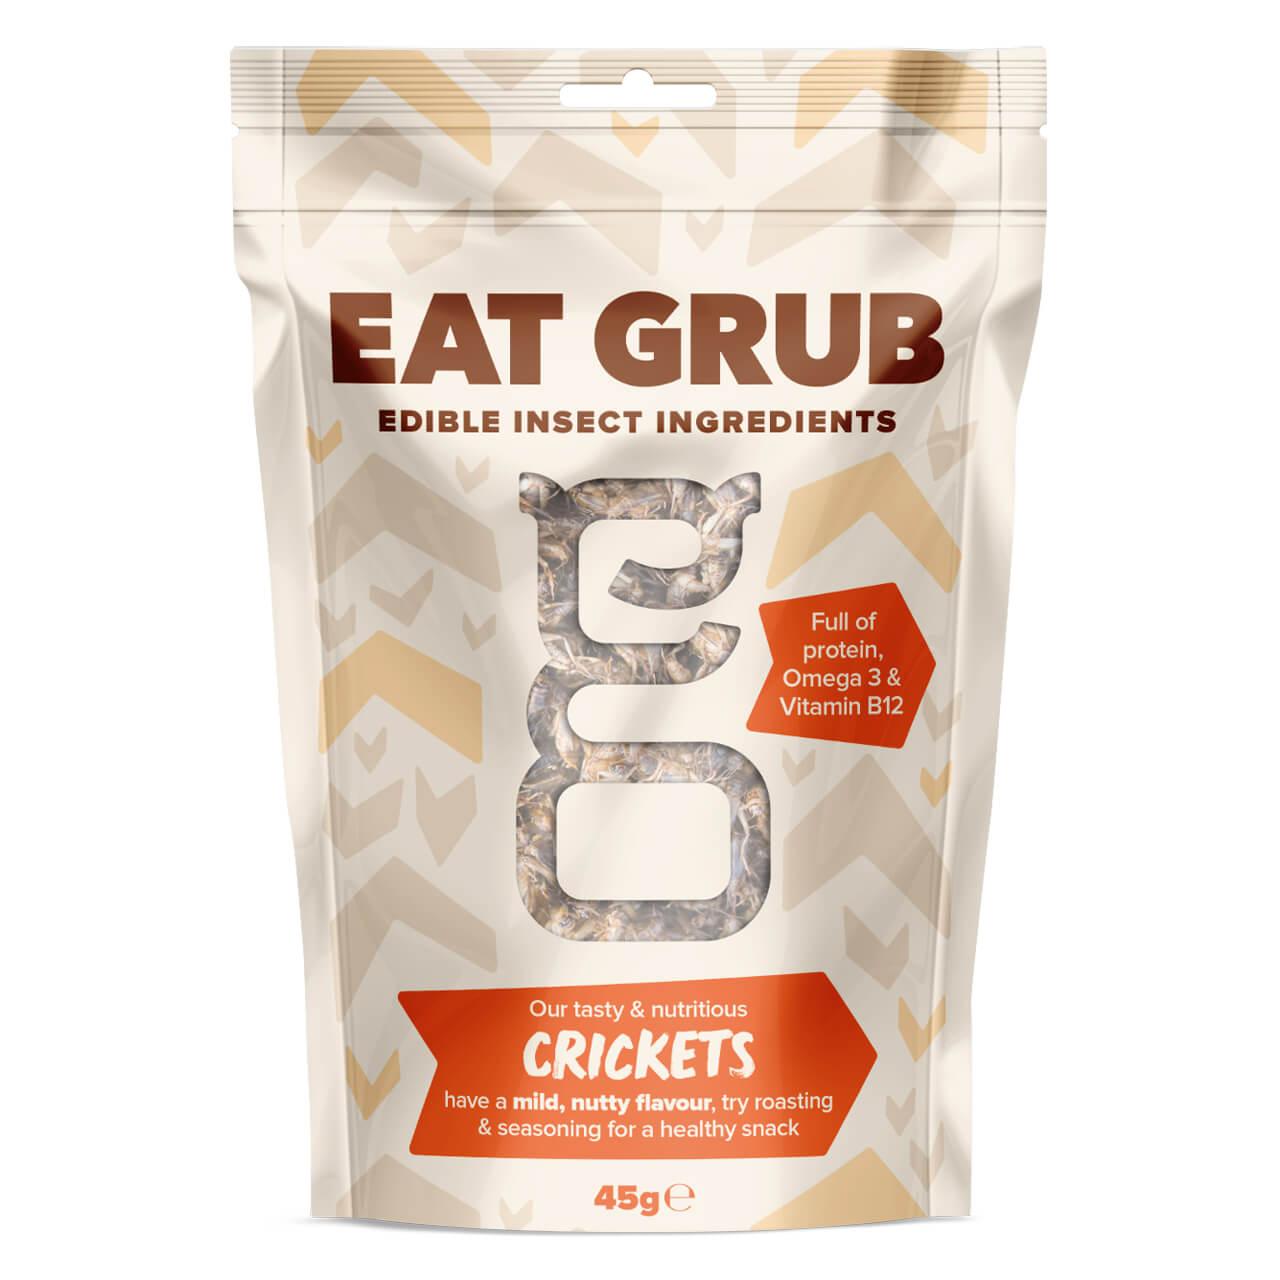 Eat Grub クッキングシリーズBIG クリケット(コオロギ) 45g